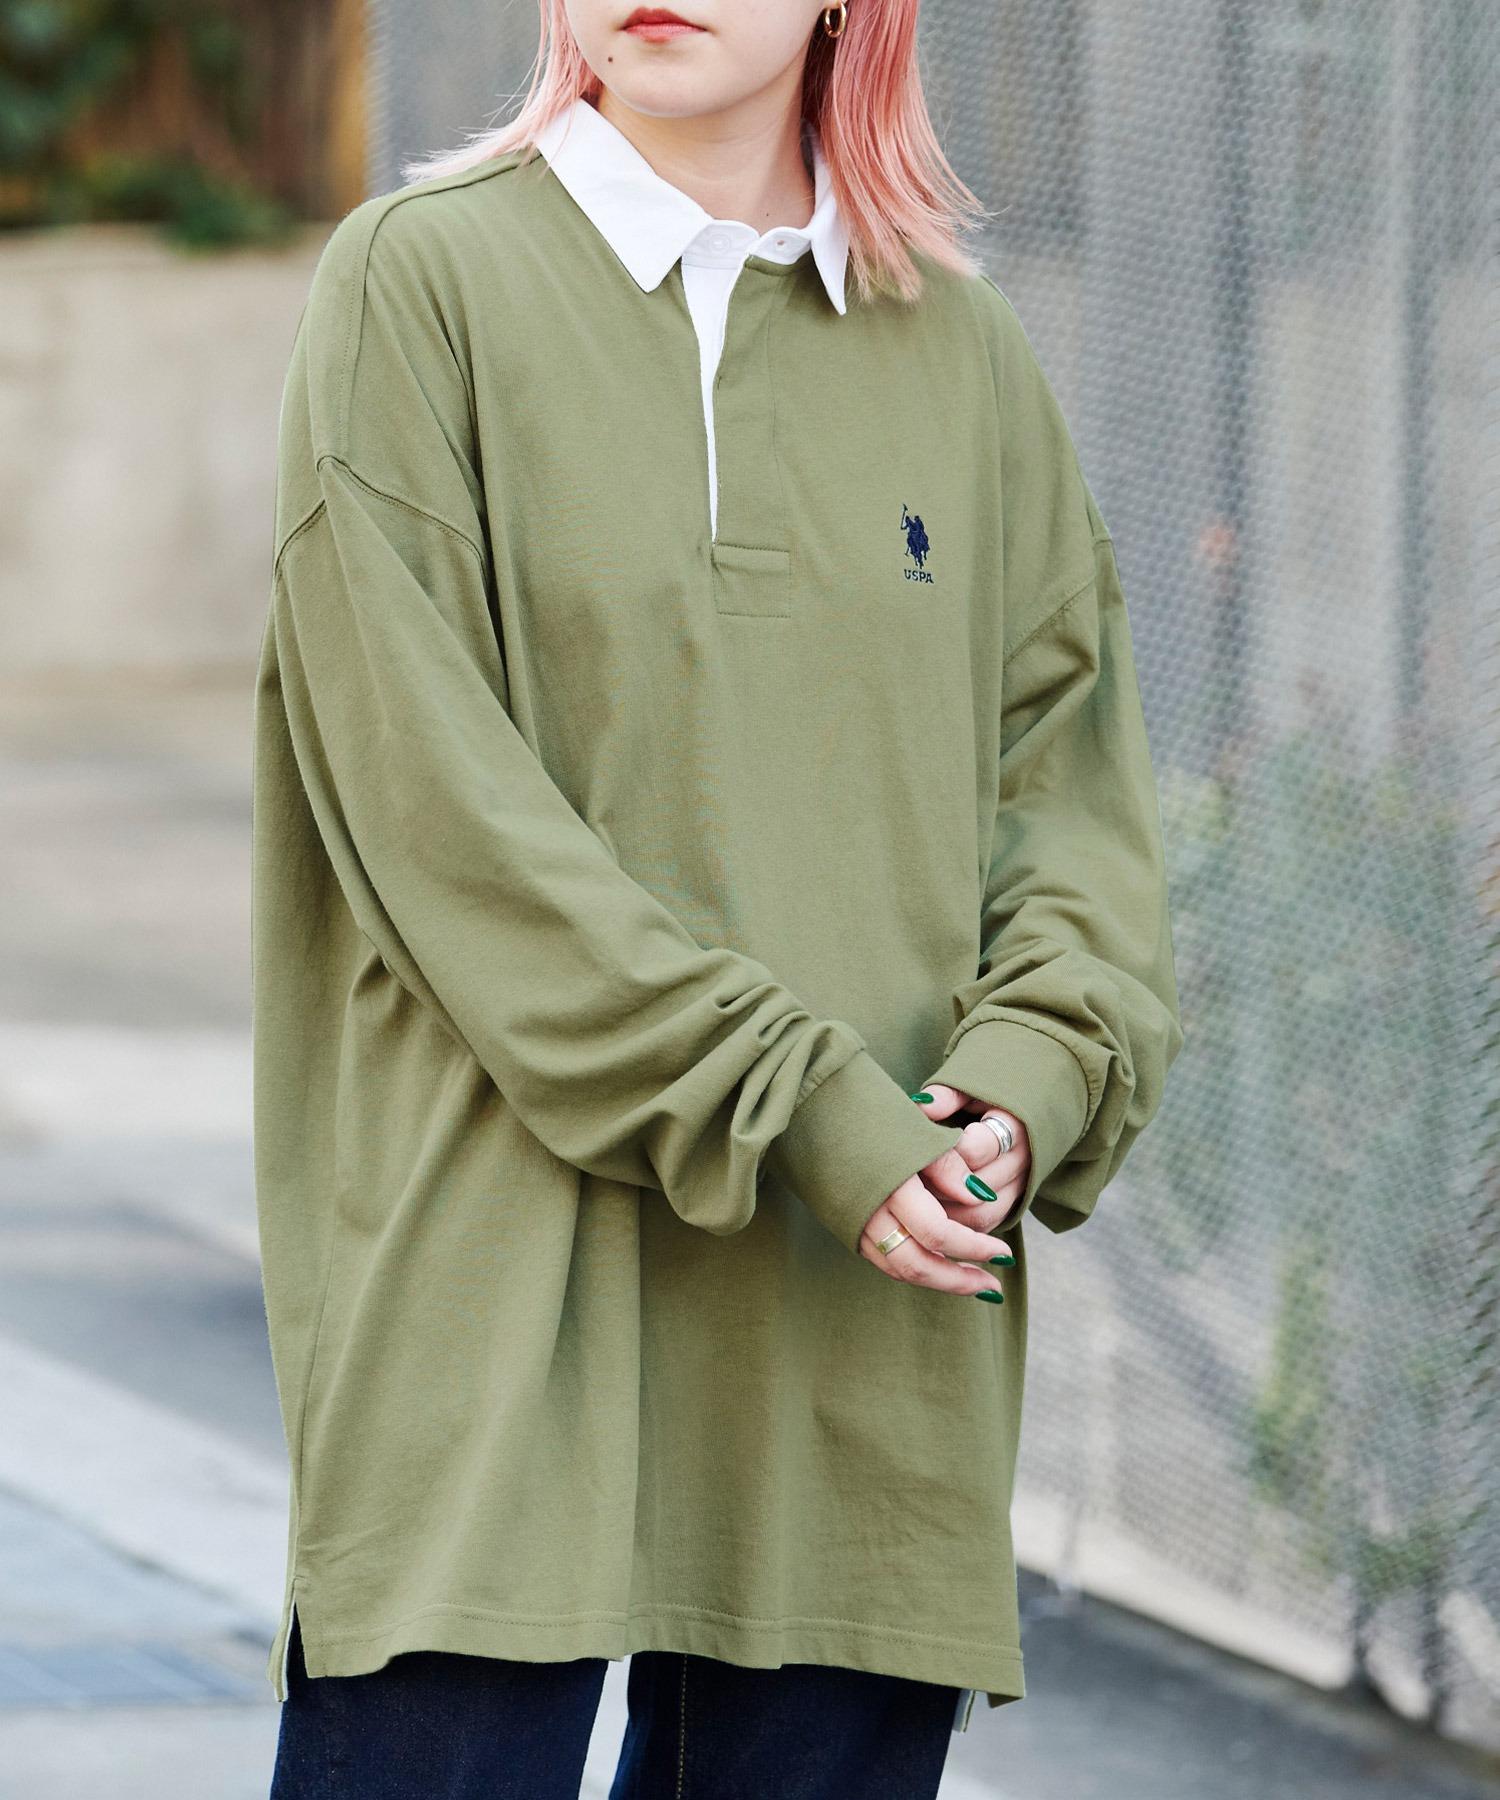 U.S. POLO ASSN. /ユーエスポロアッスン 別注 ワンポイント刺繍 オーバーサイズ ラガーシャツ